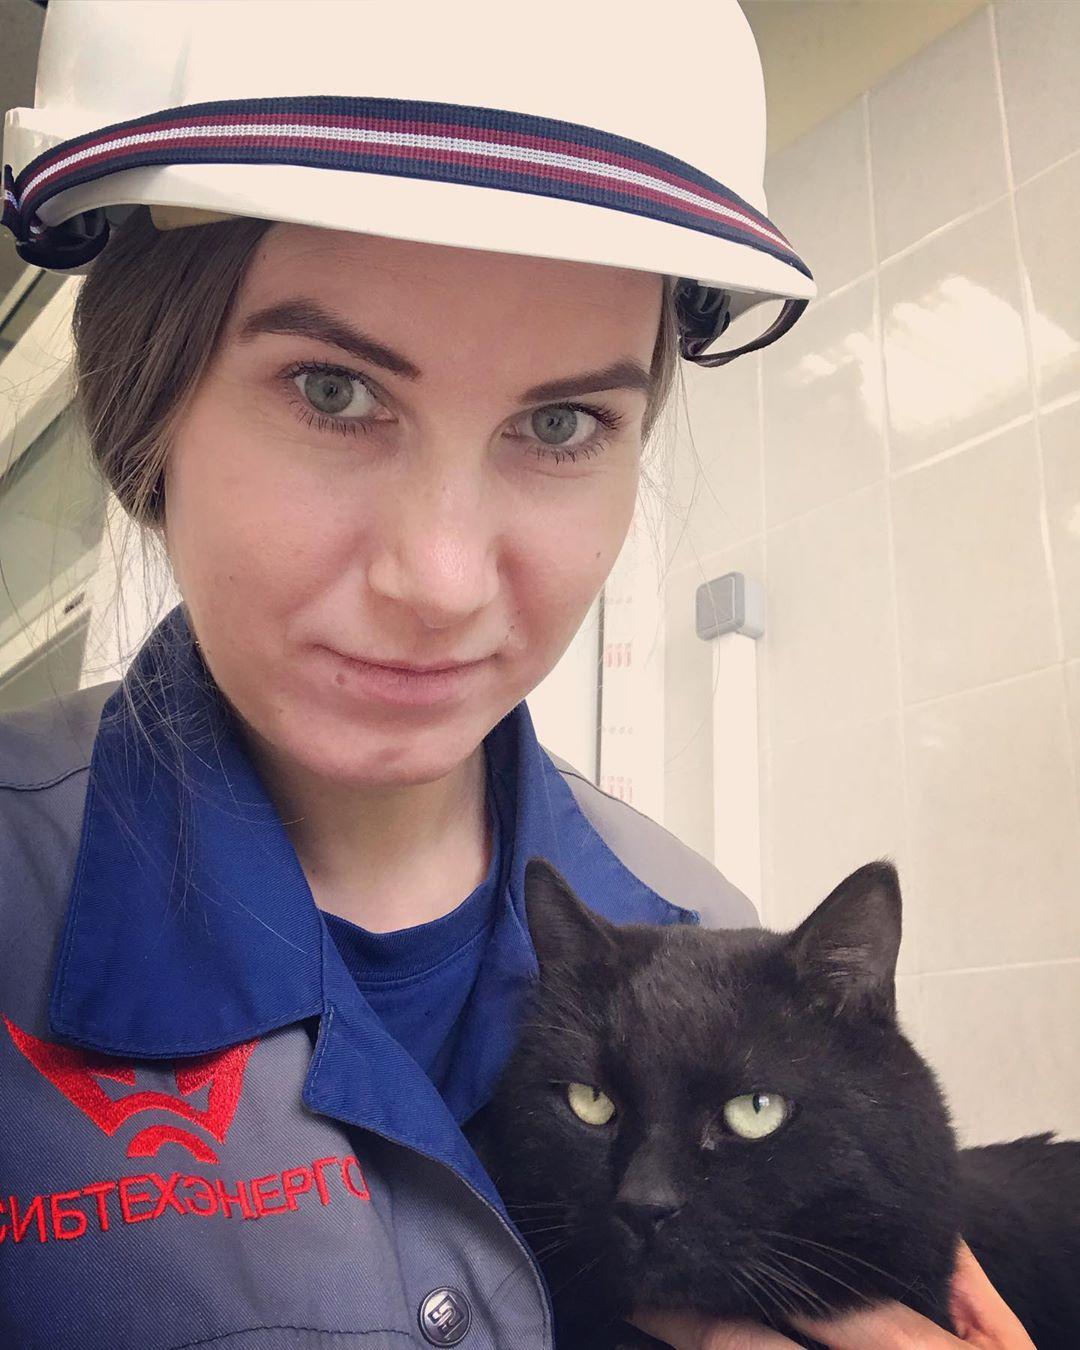 Много времени Анастасия проводит в разъездах по работе